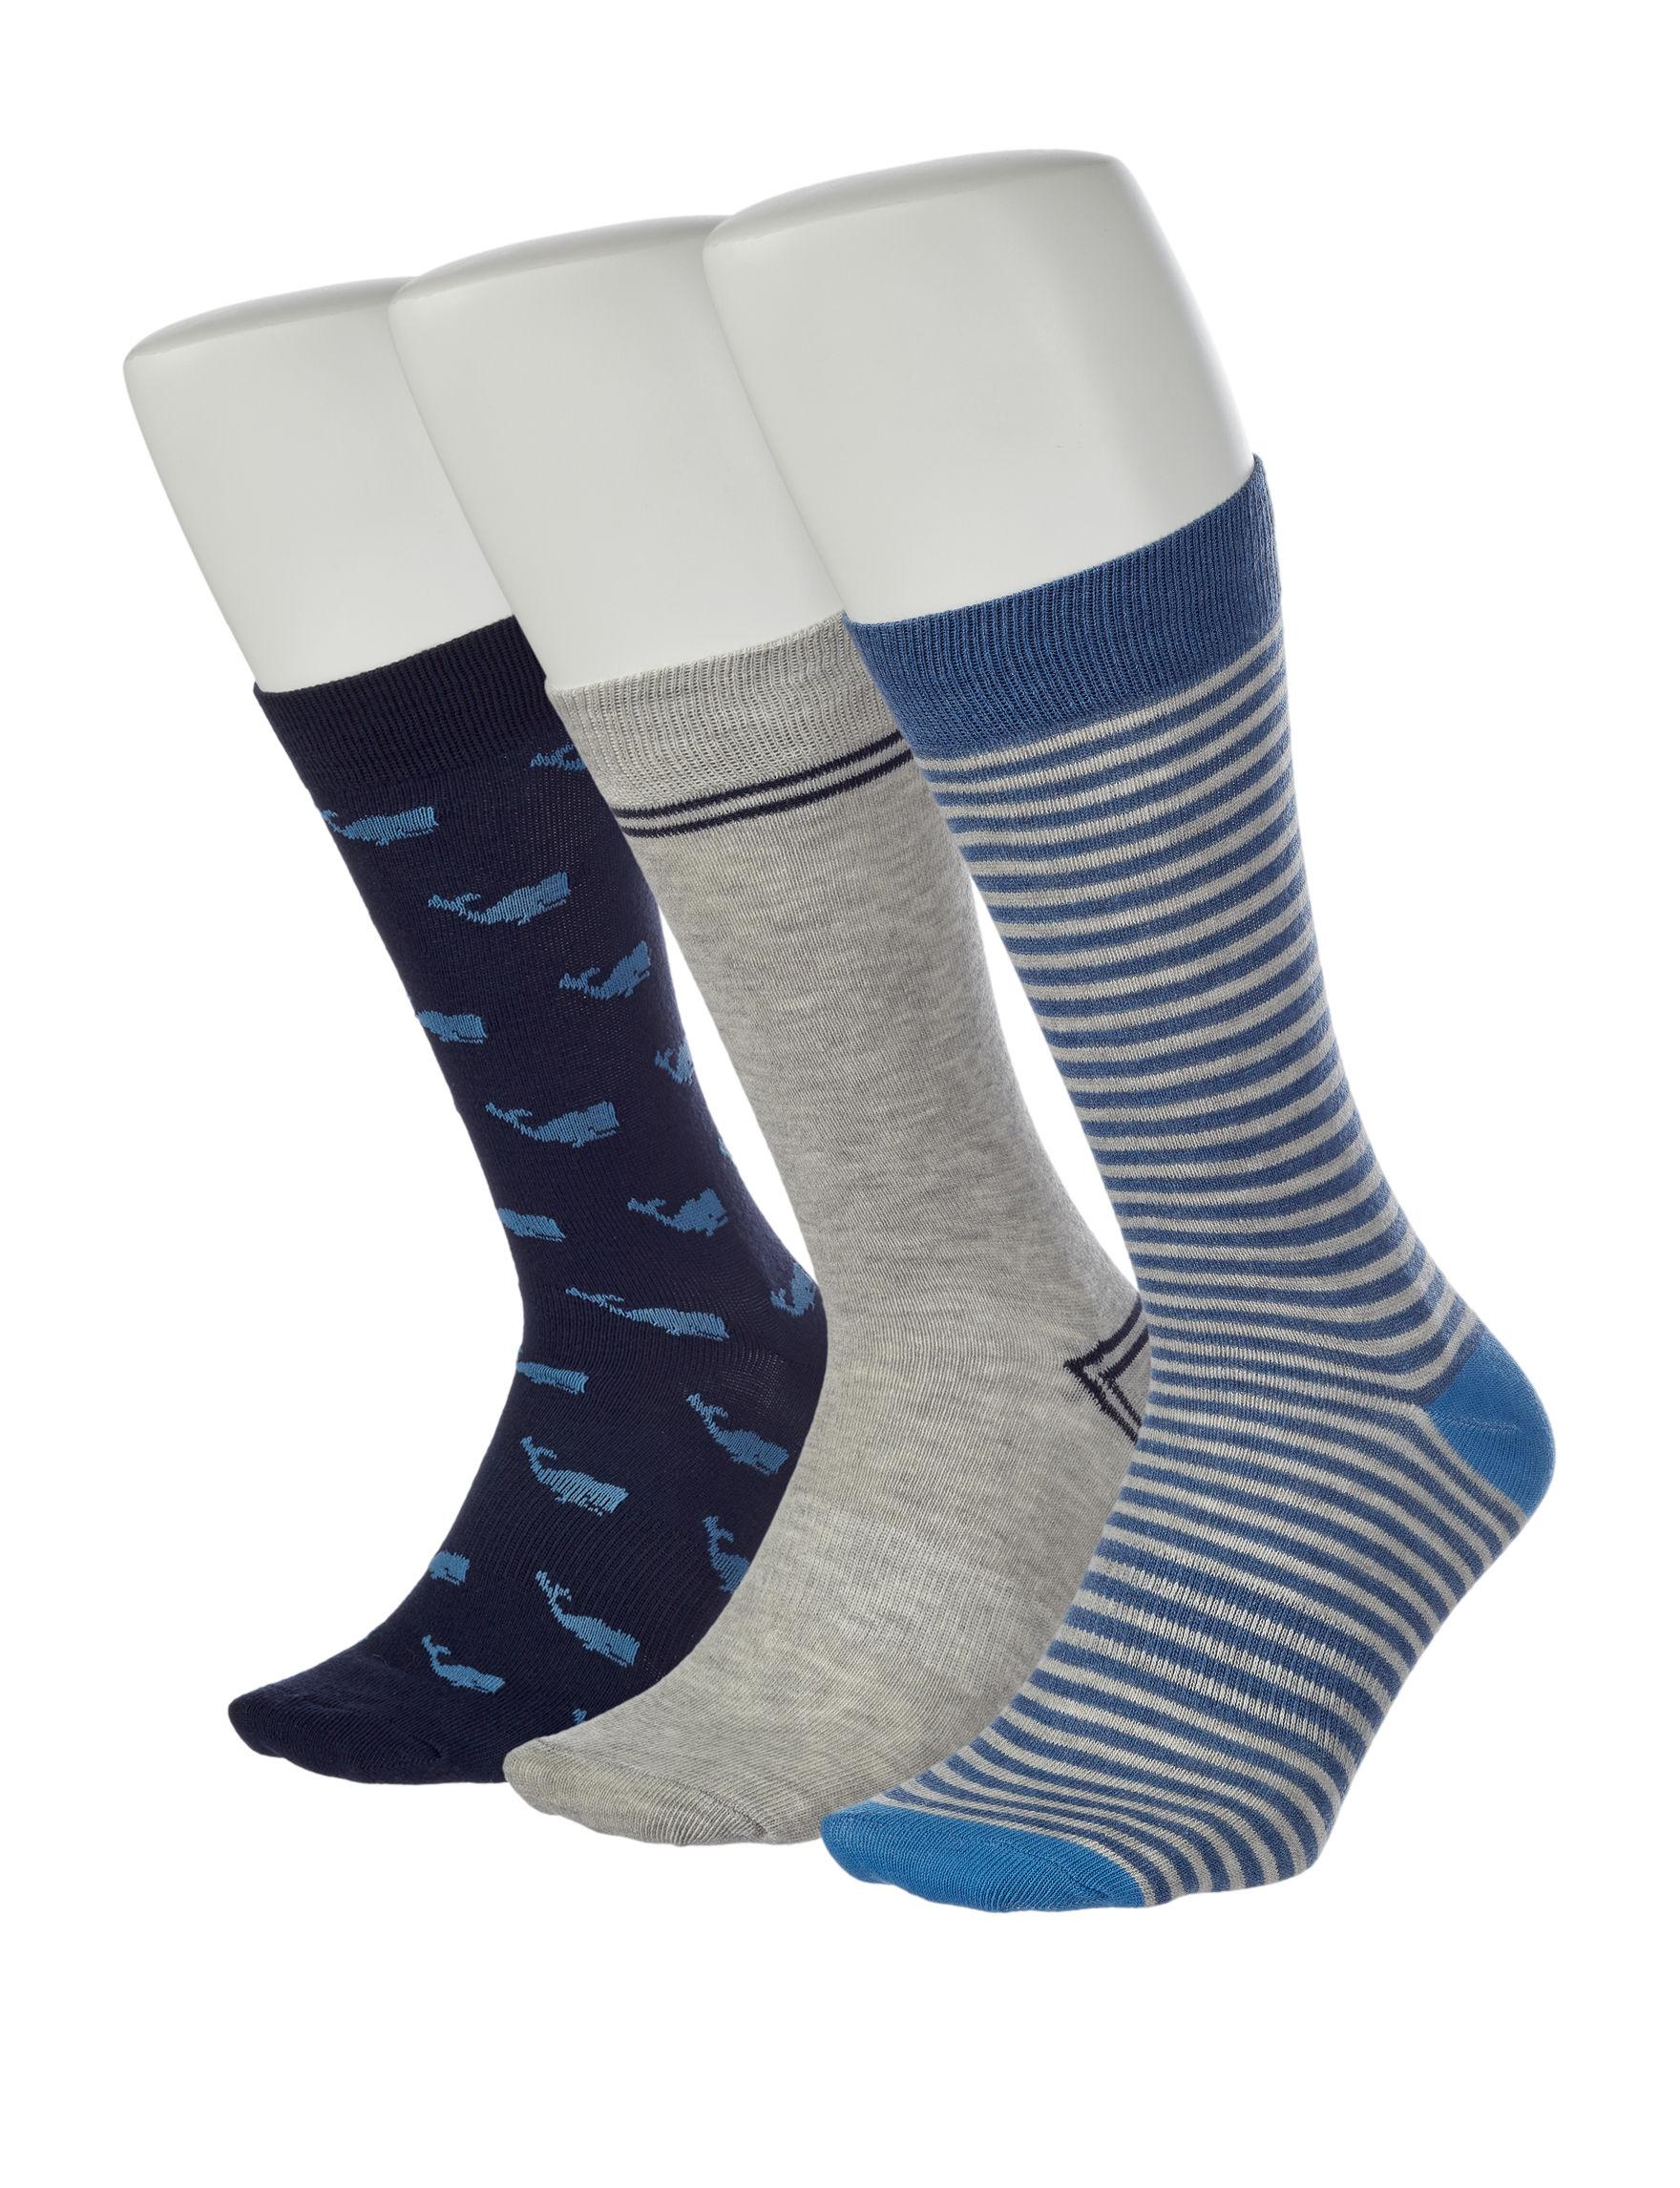 Ivy Crew Blue / Multi Socks